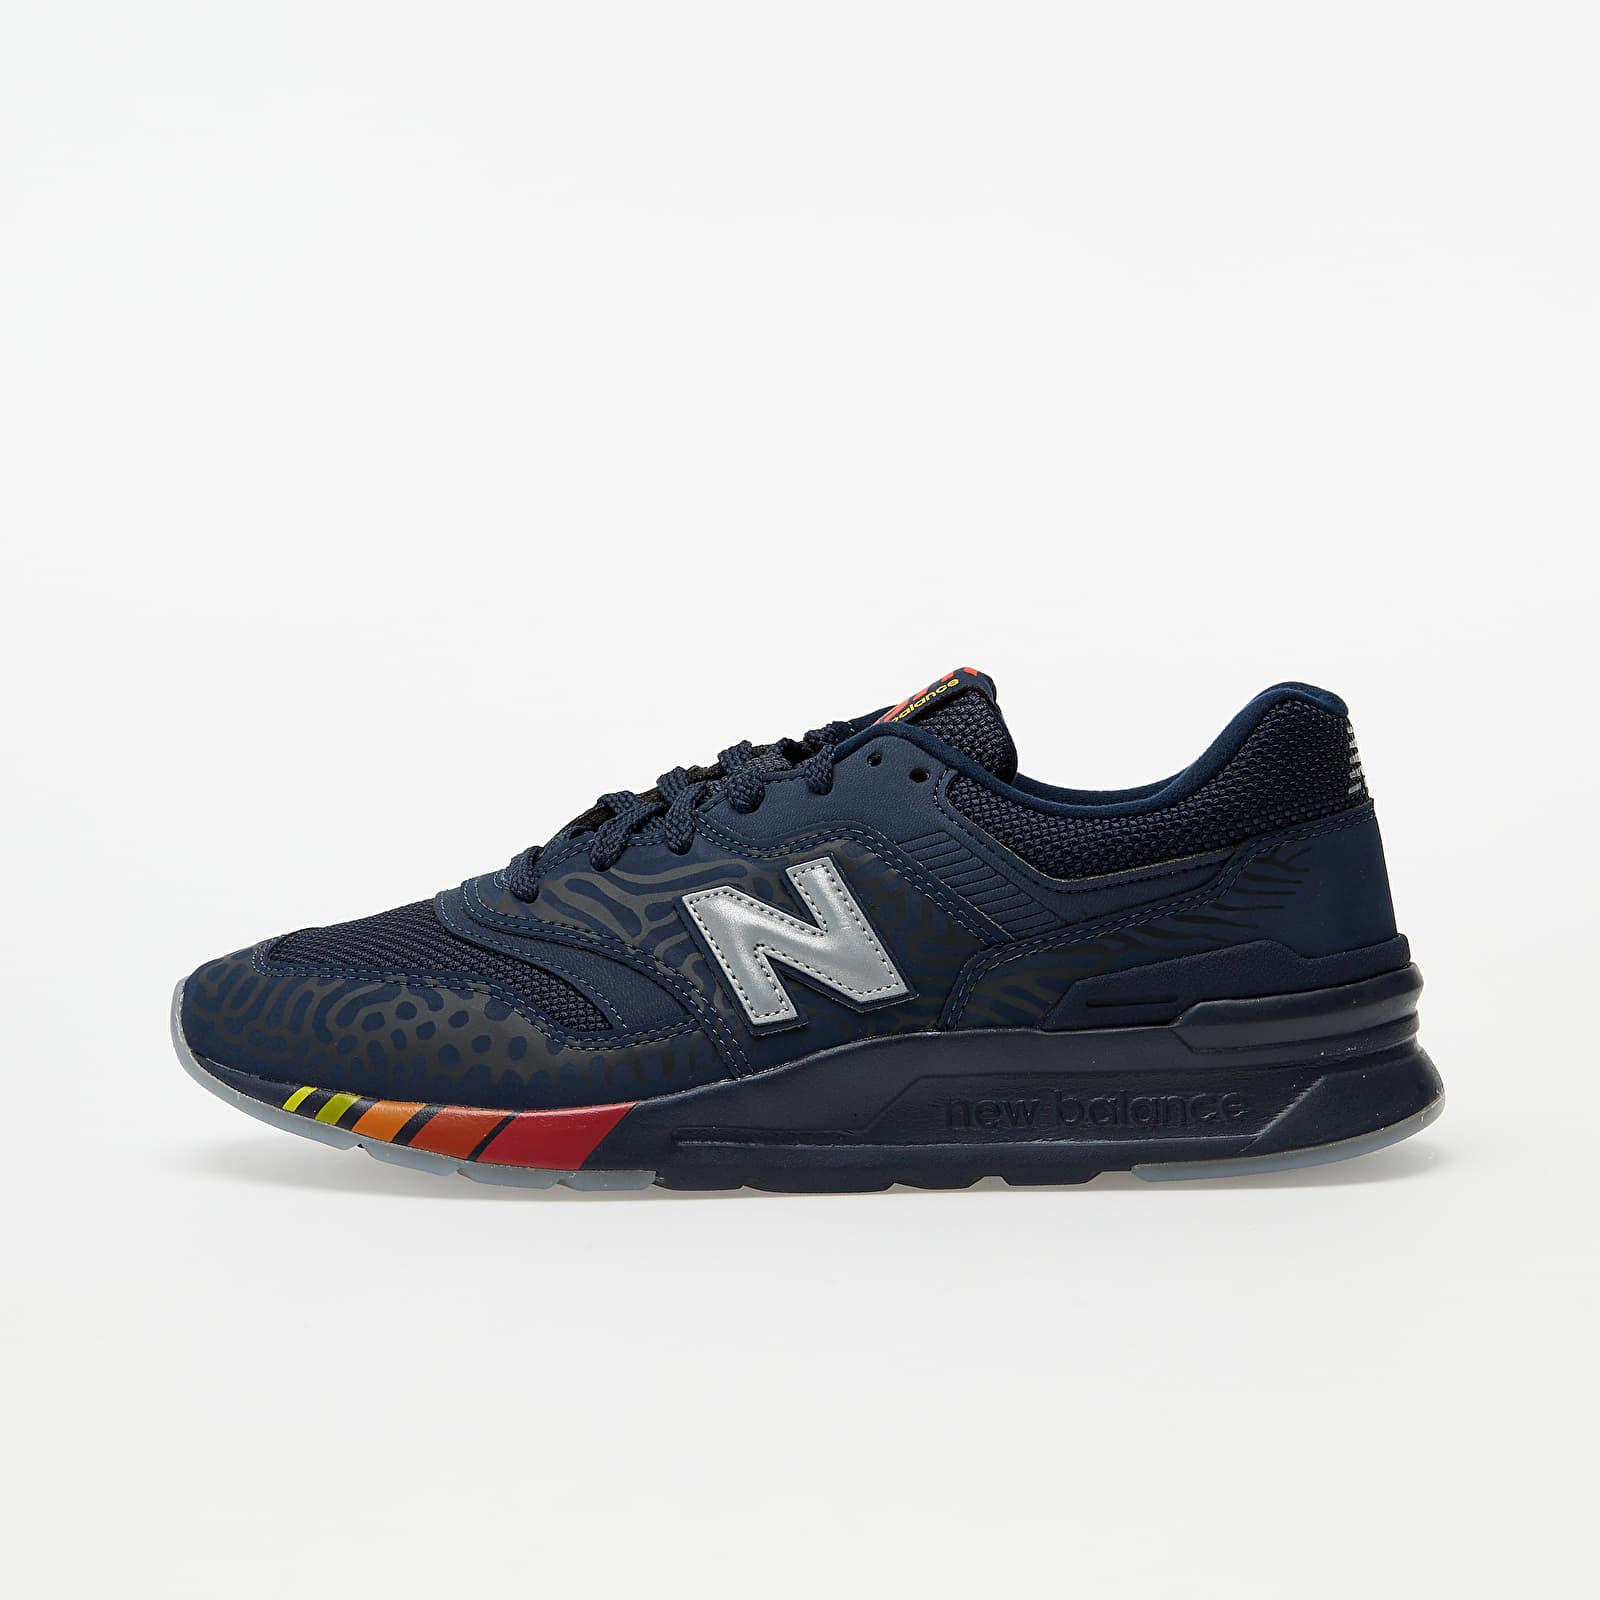 New Balance 997 Black EUR 40.5